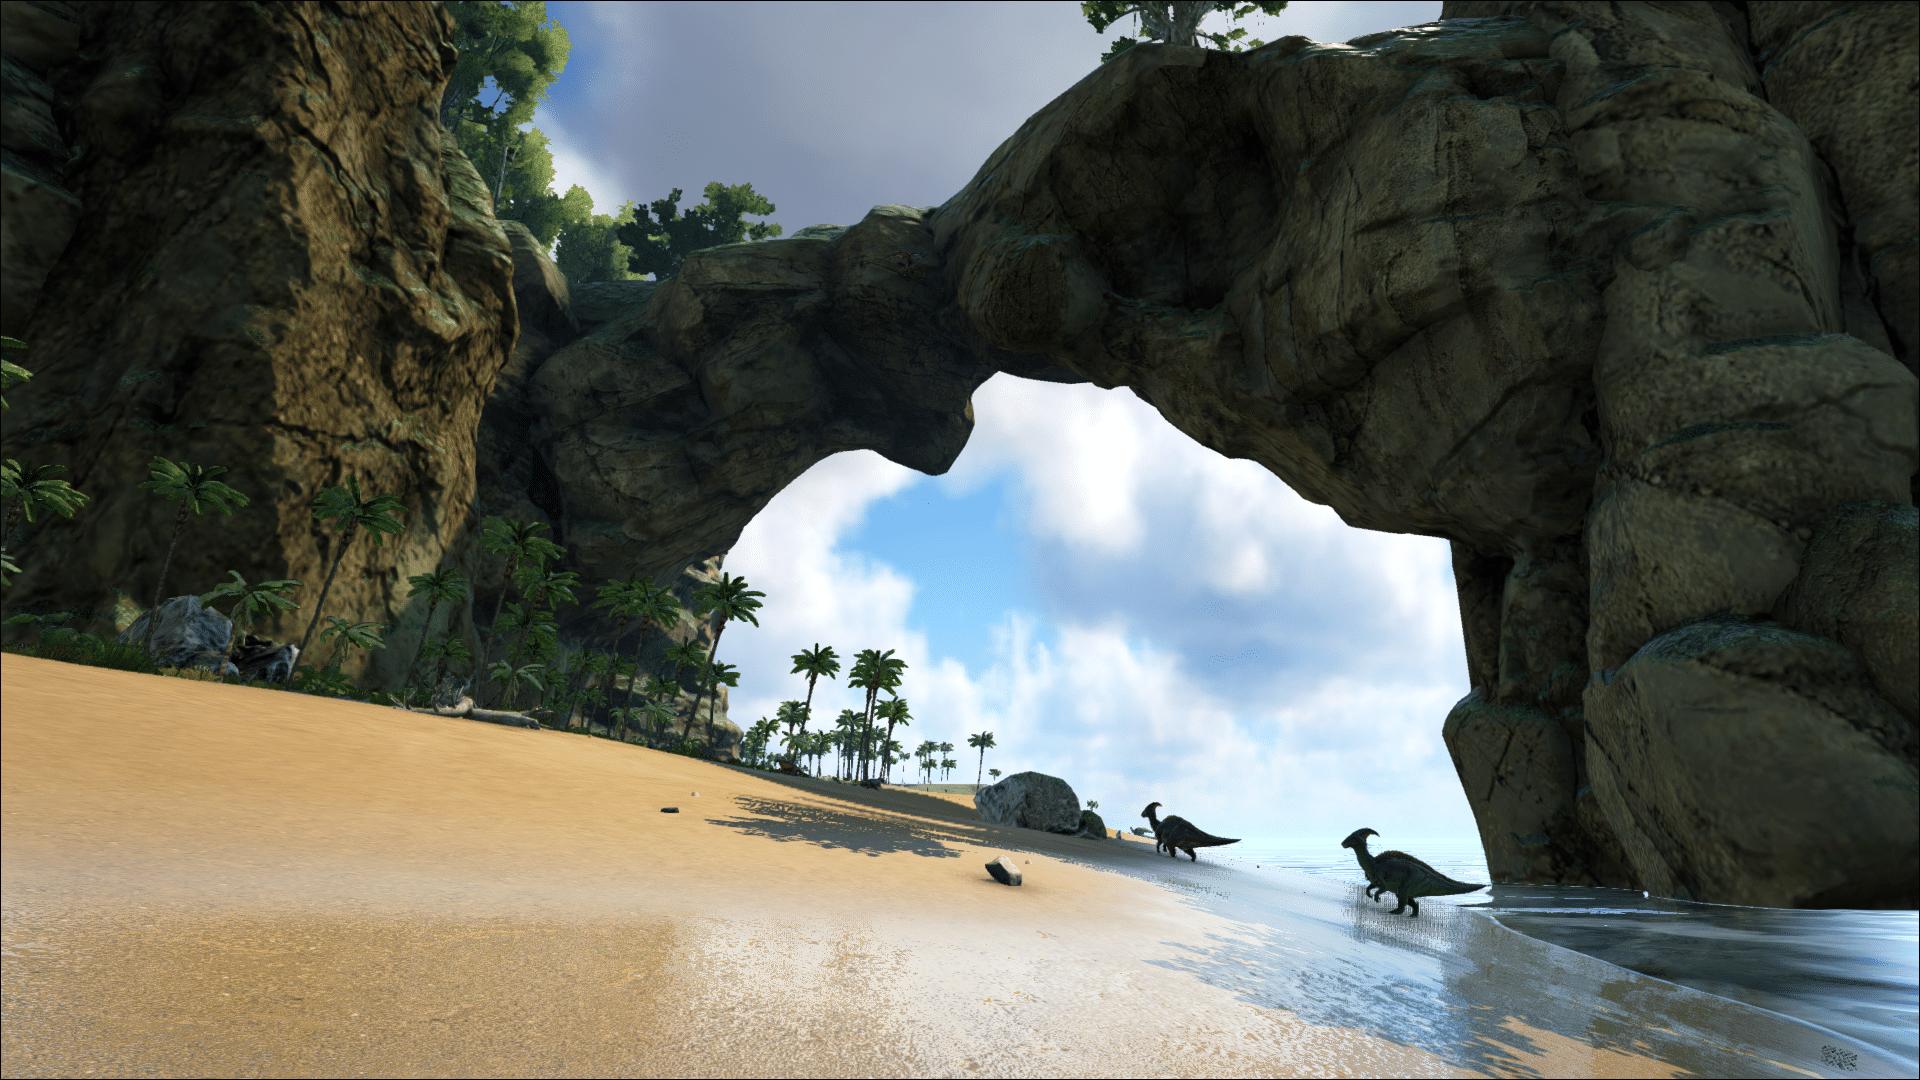 Looking down the beach on Ark: Ragnarok